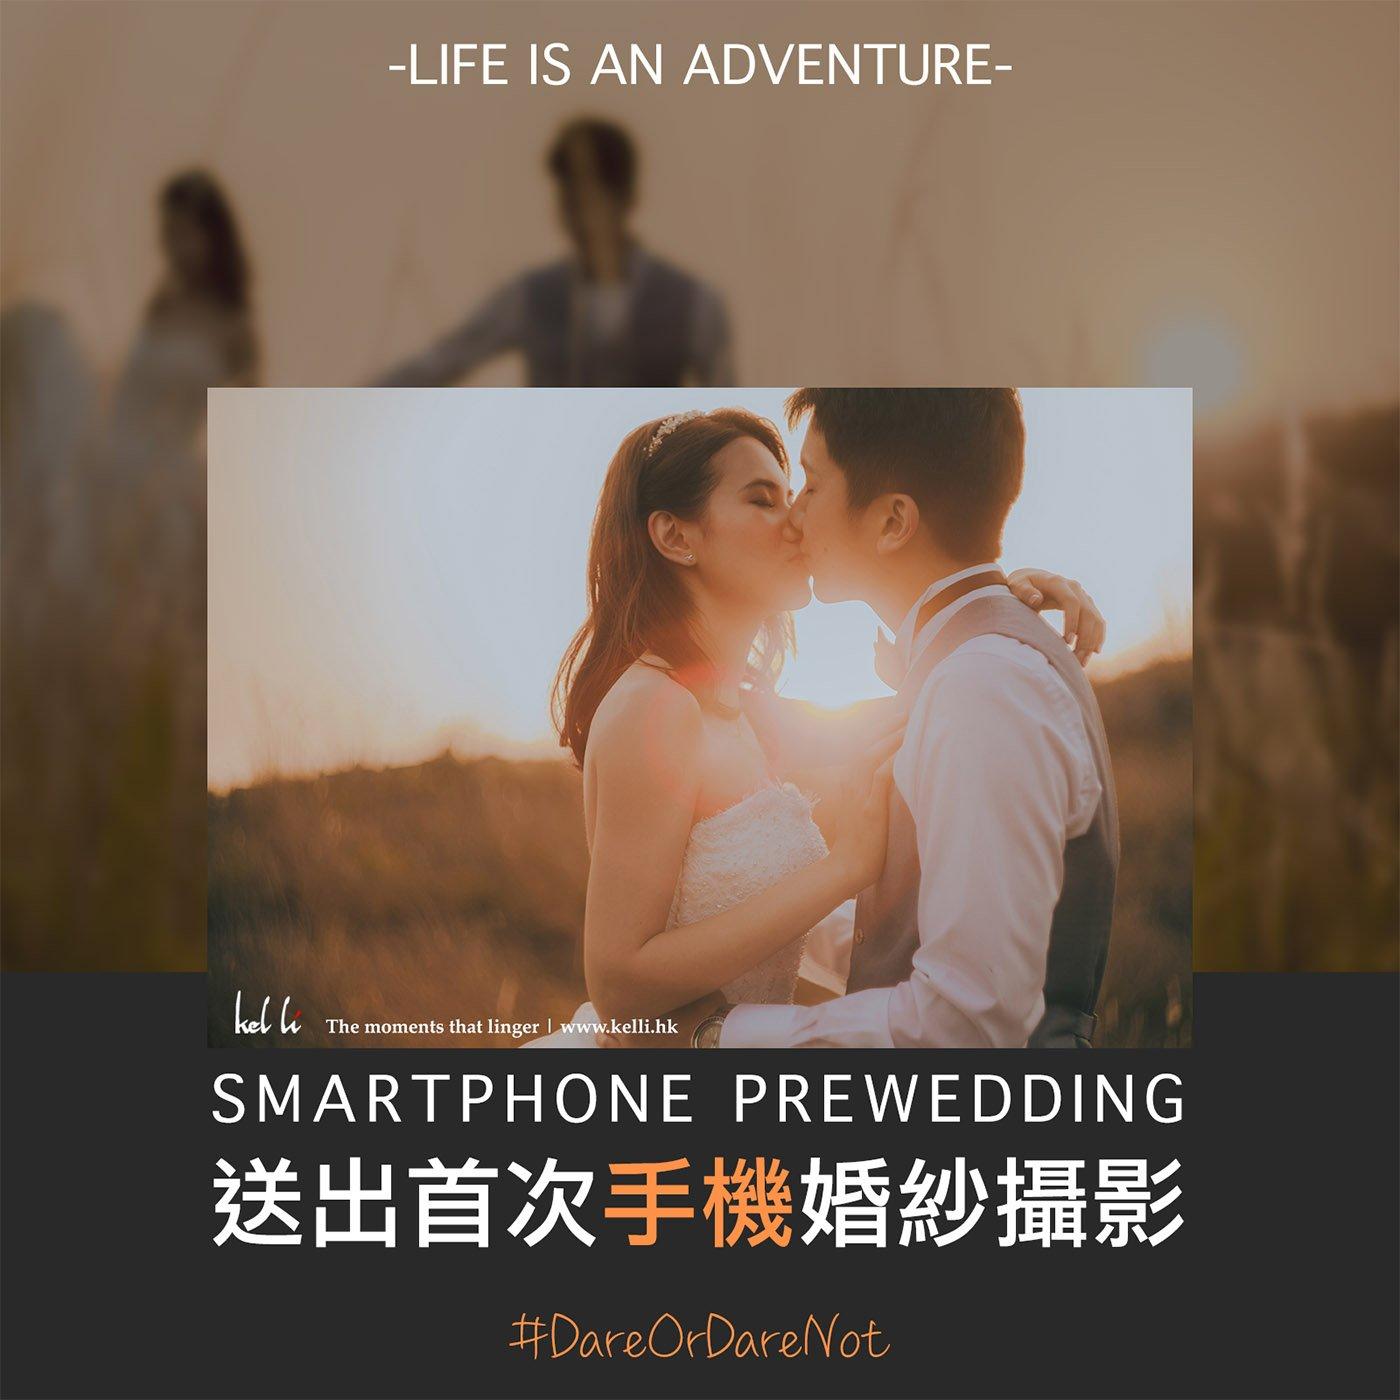 手機婚紗攝影 SmartphonePortrait 手機影婚紗相